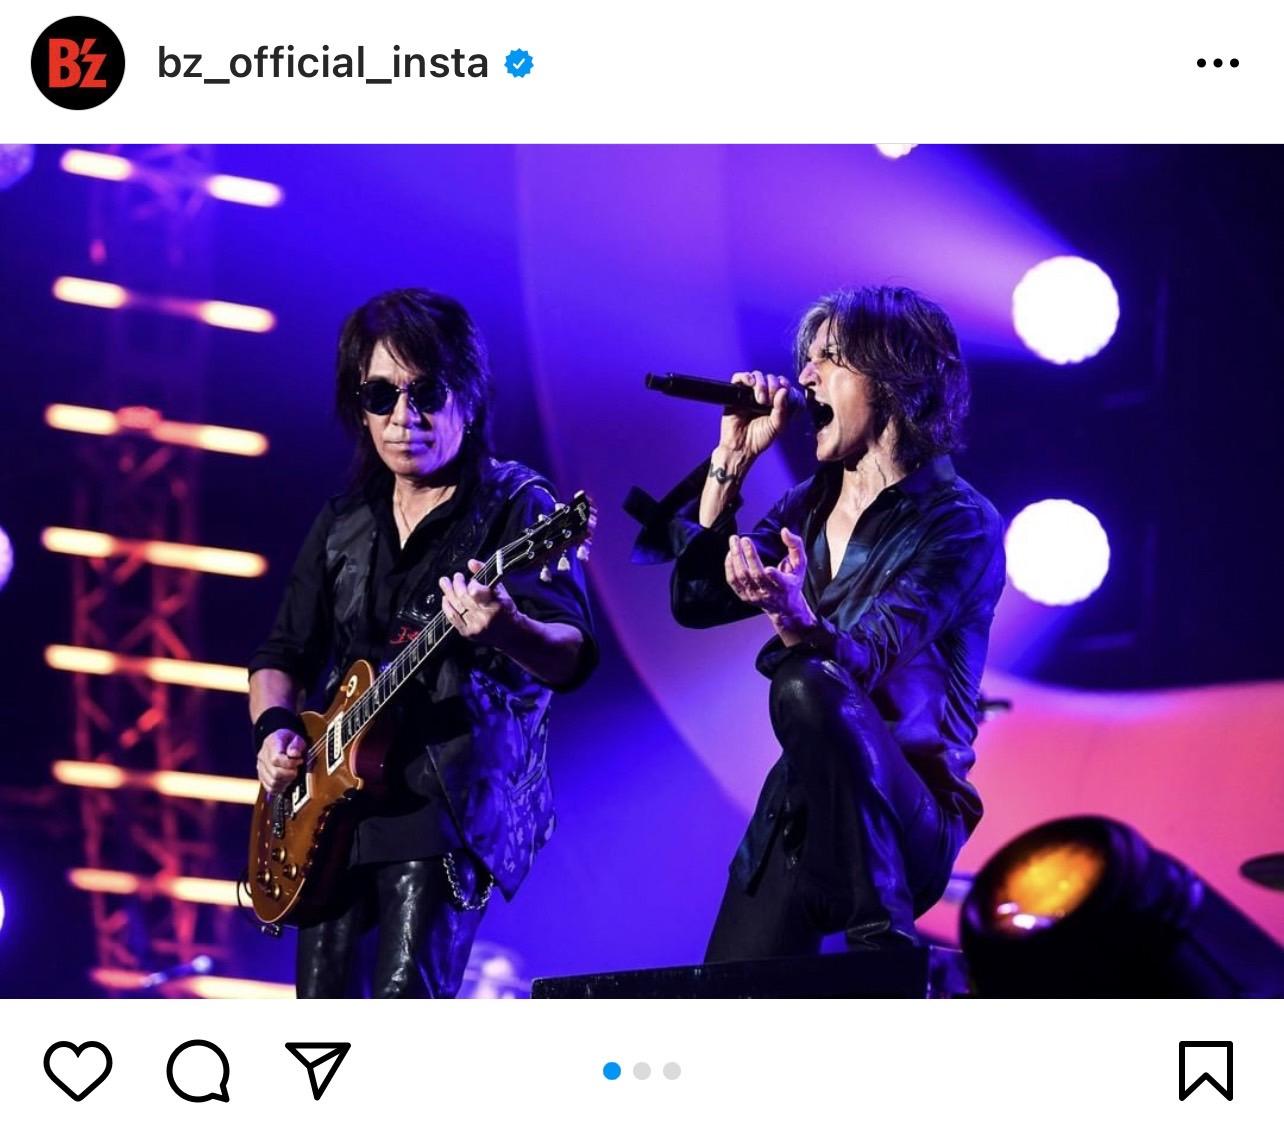 B'z公式SNSで公開された『テレビ朝日ドリームフェスティバル2021』のステージ写真